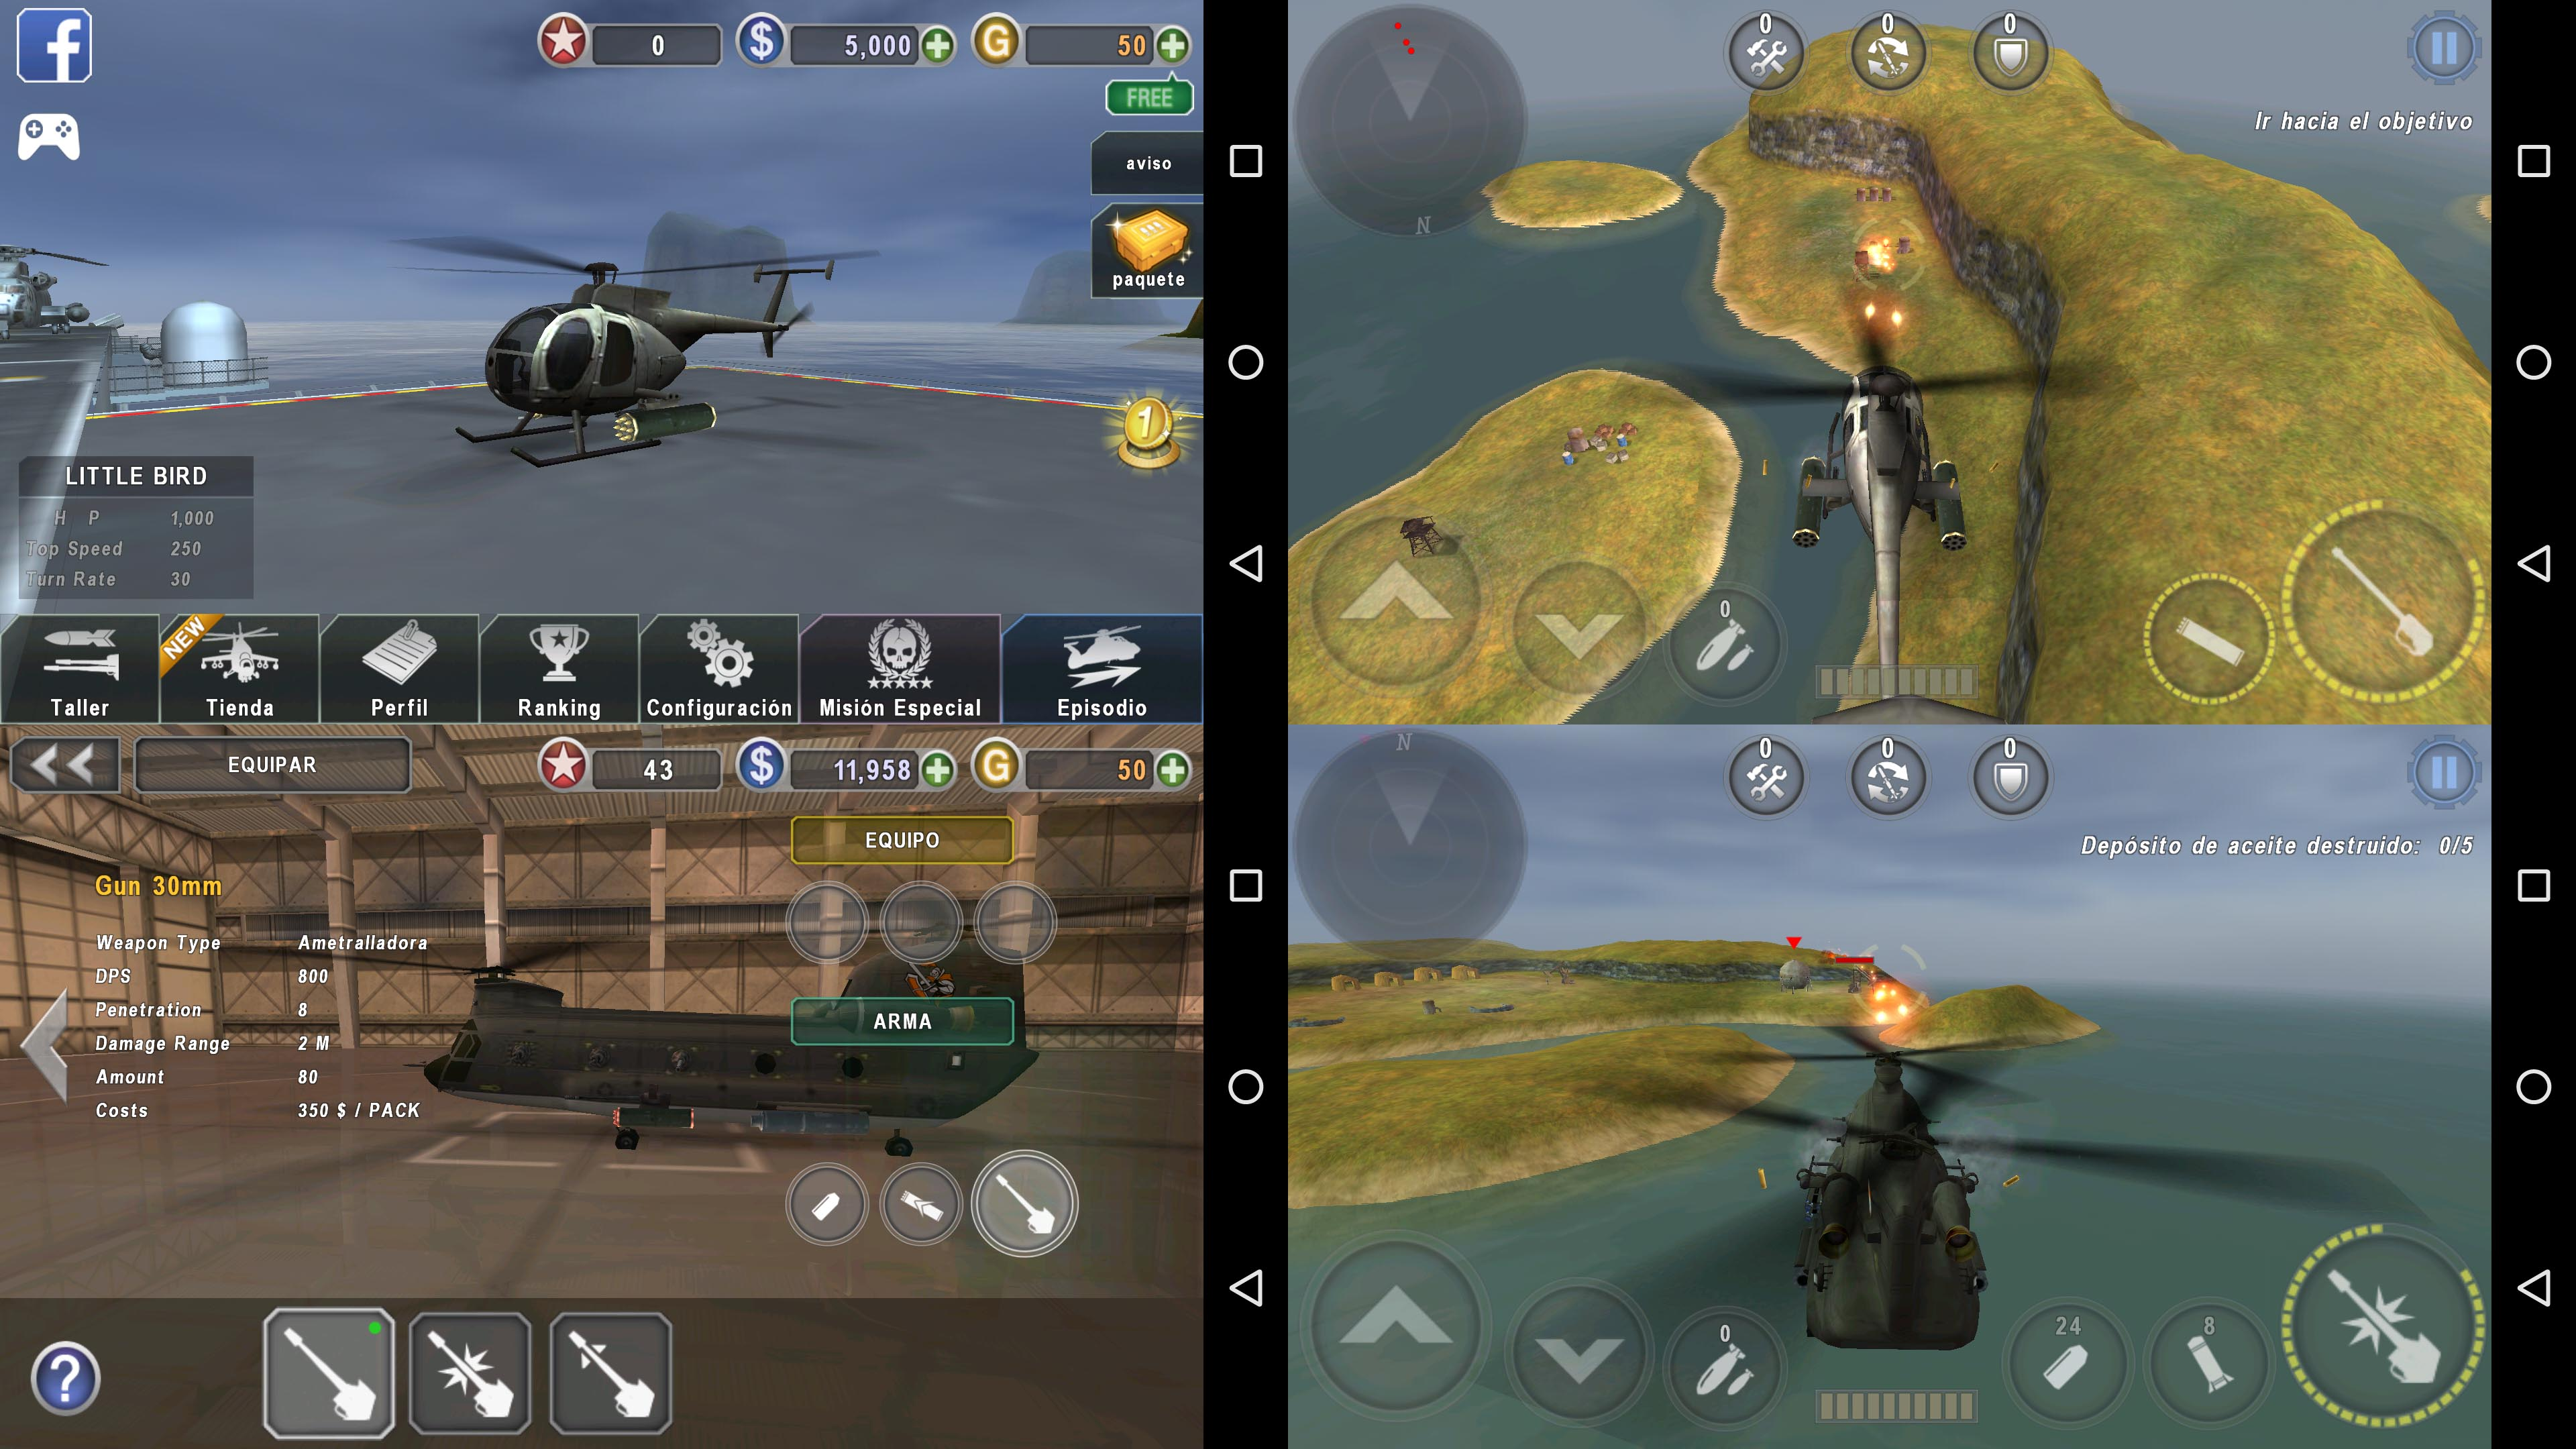 gunship-helicopter-1